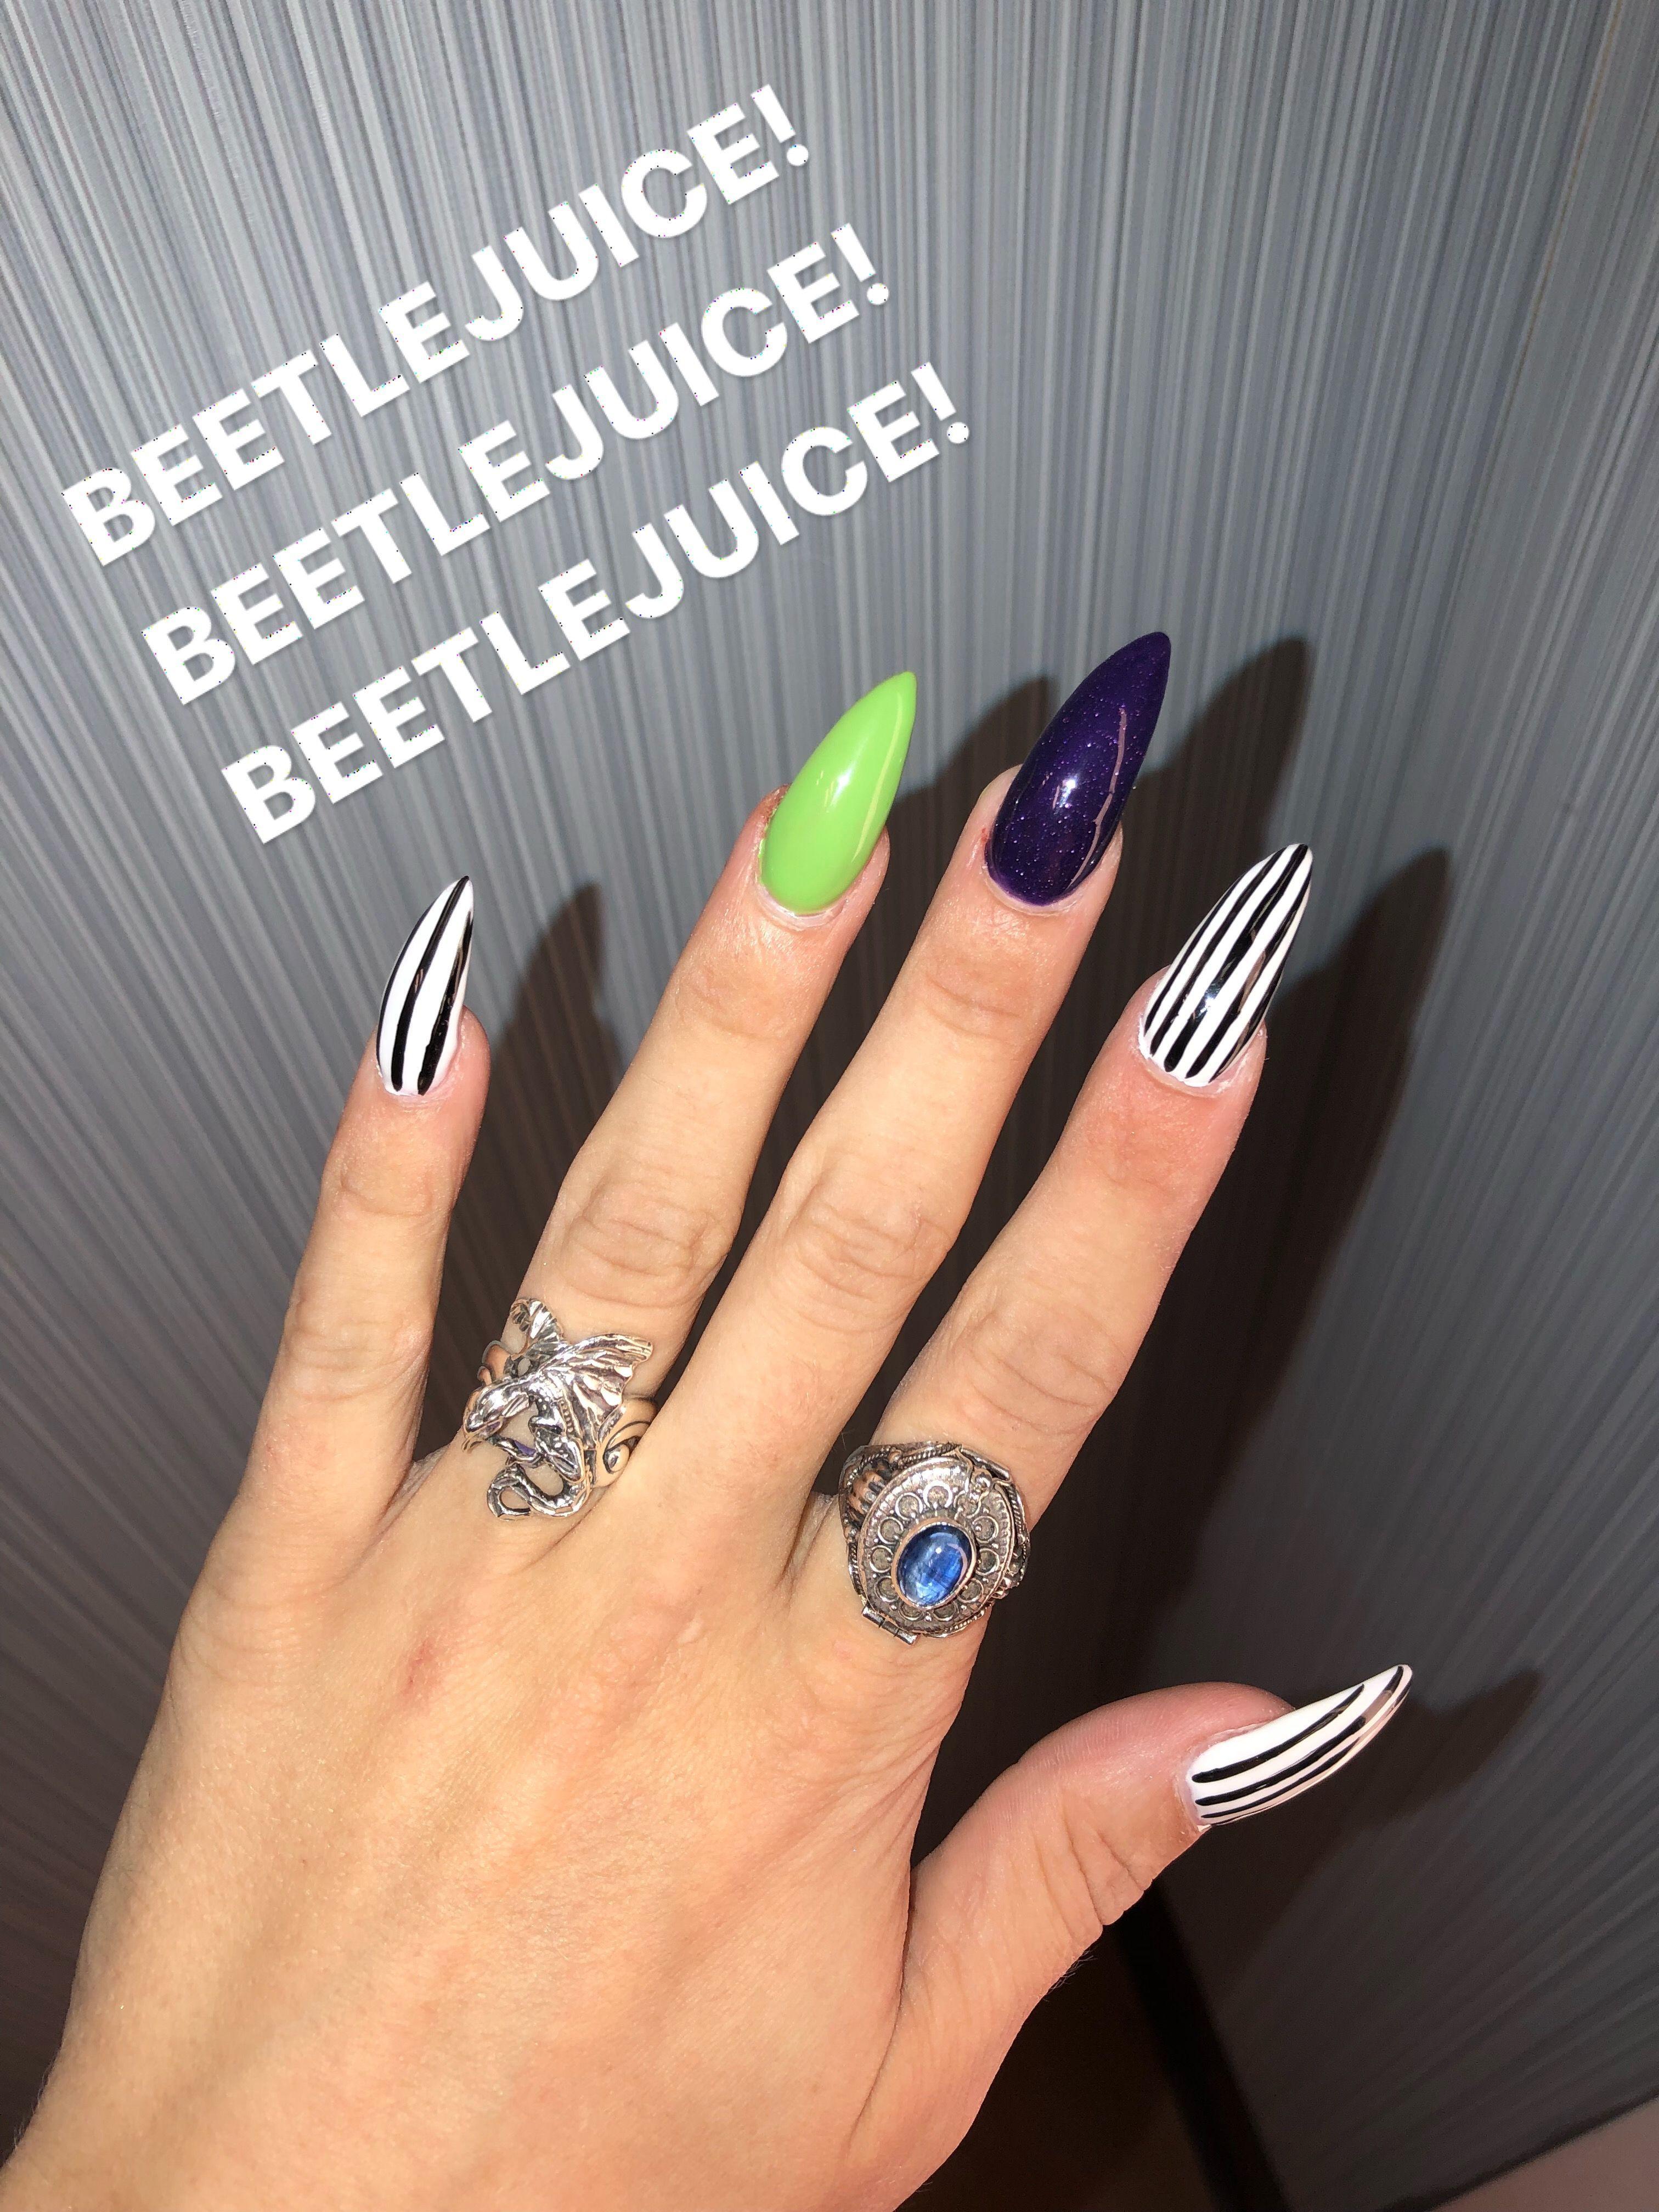 BEETLEJUICE! BEETLEJUICE! BEETLEJUICE! | Halloween nails ...